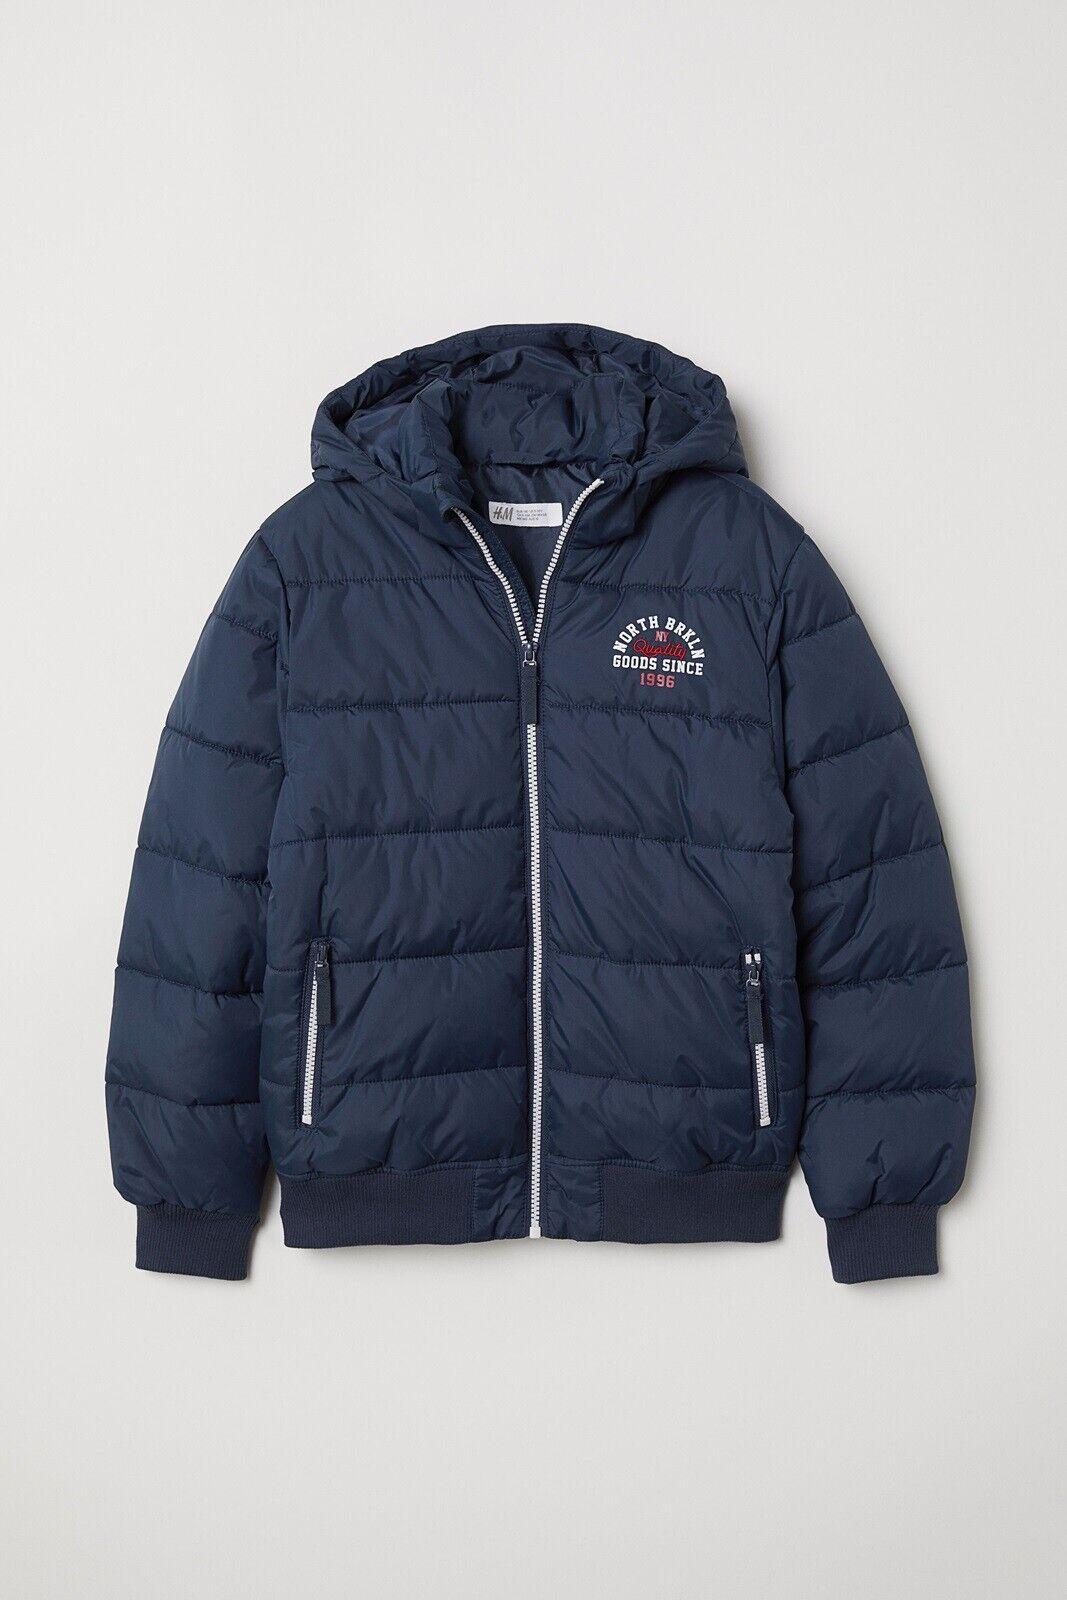 Vinterjakke, Vatteret jakke, H&M